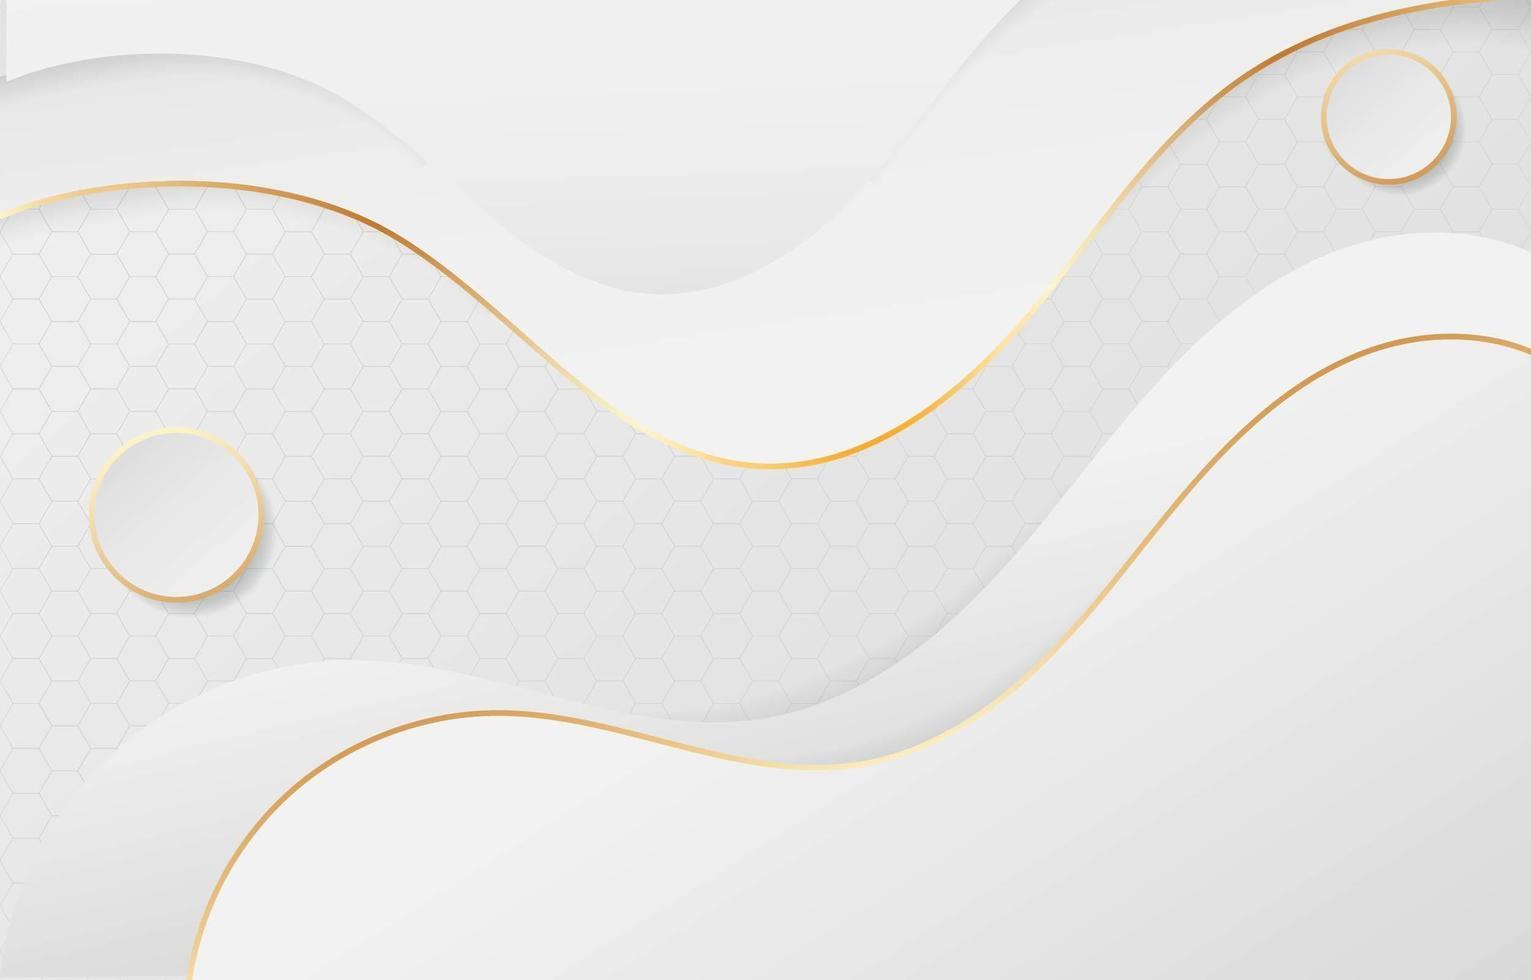 vit bakgrund papercut stil vektor